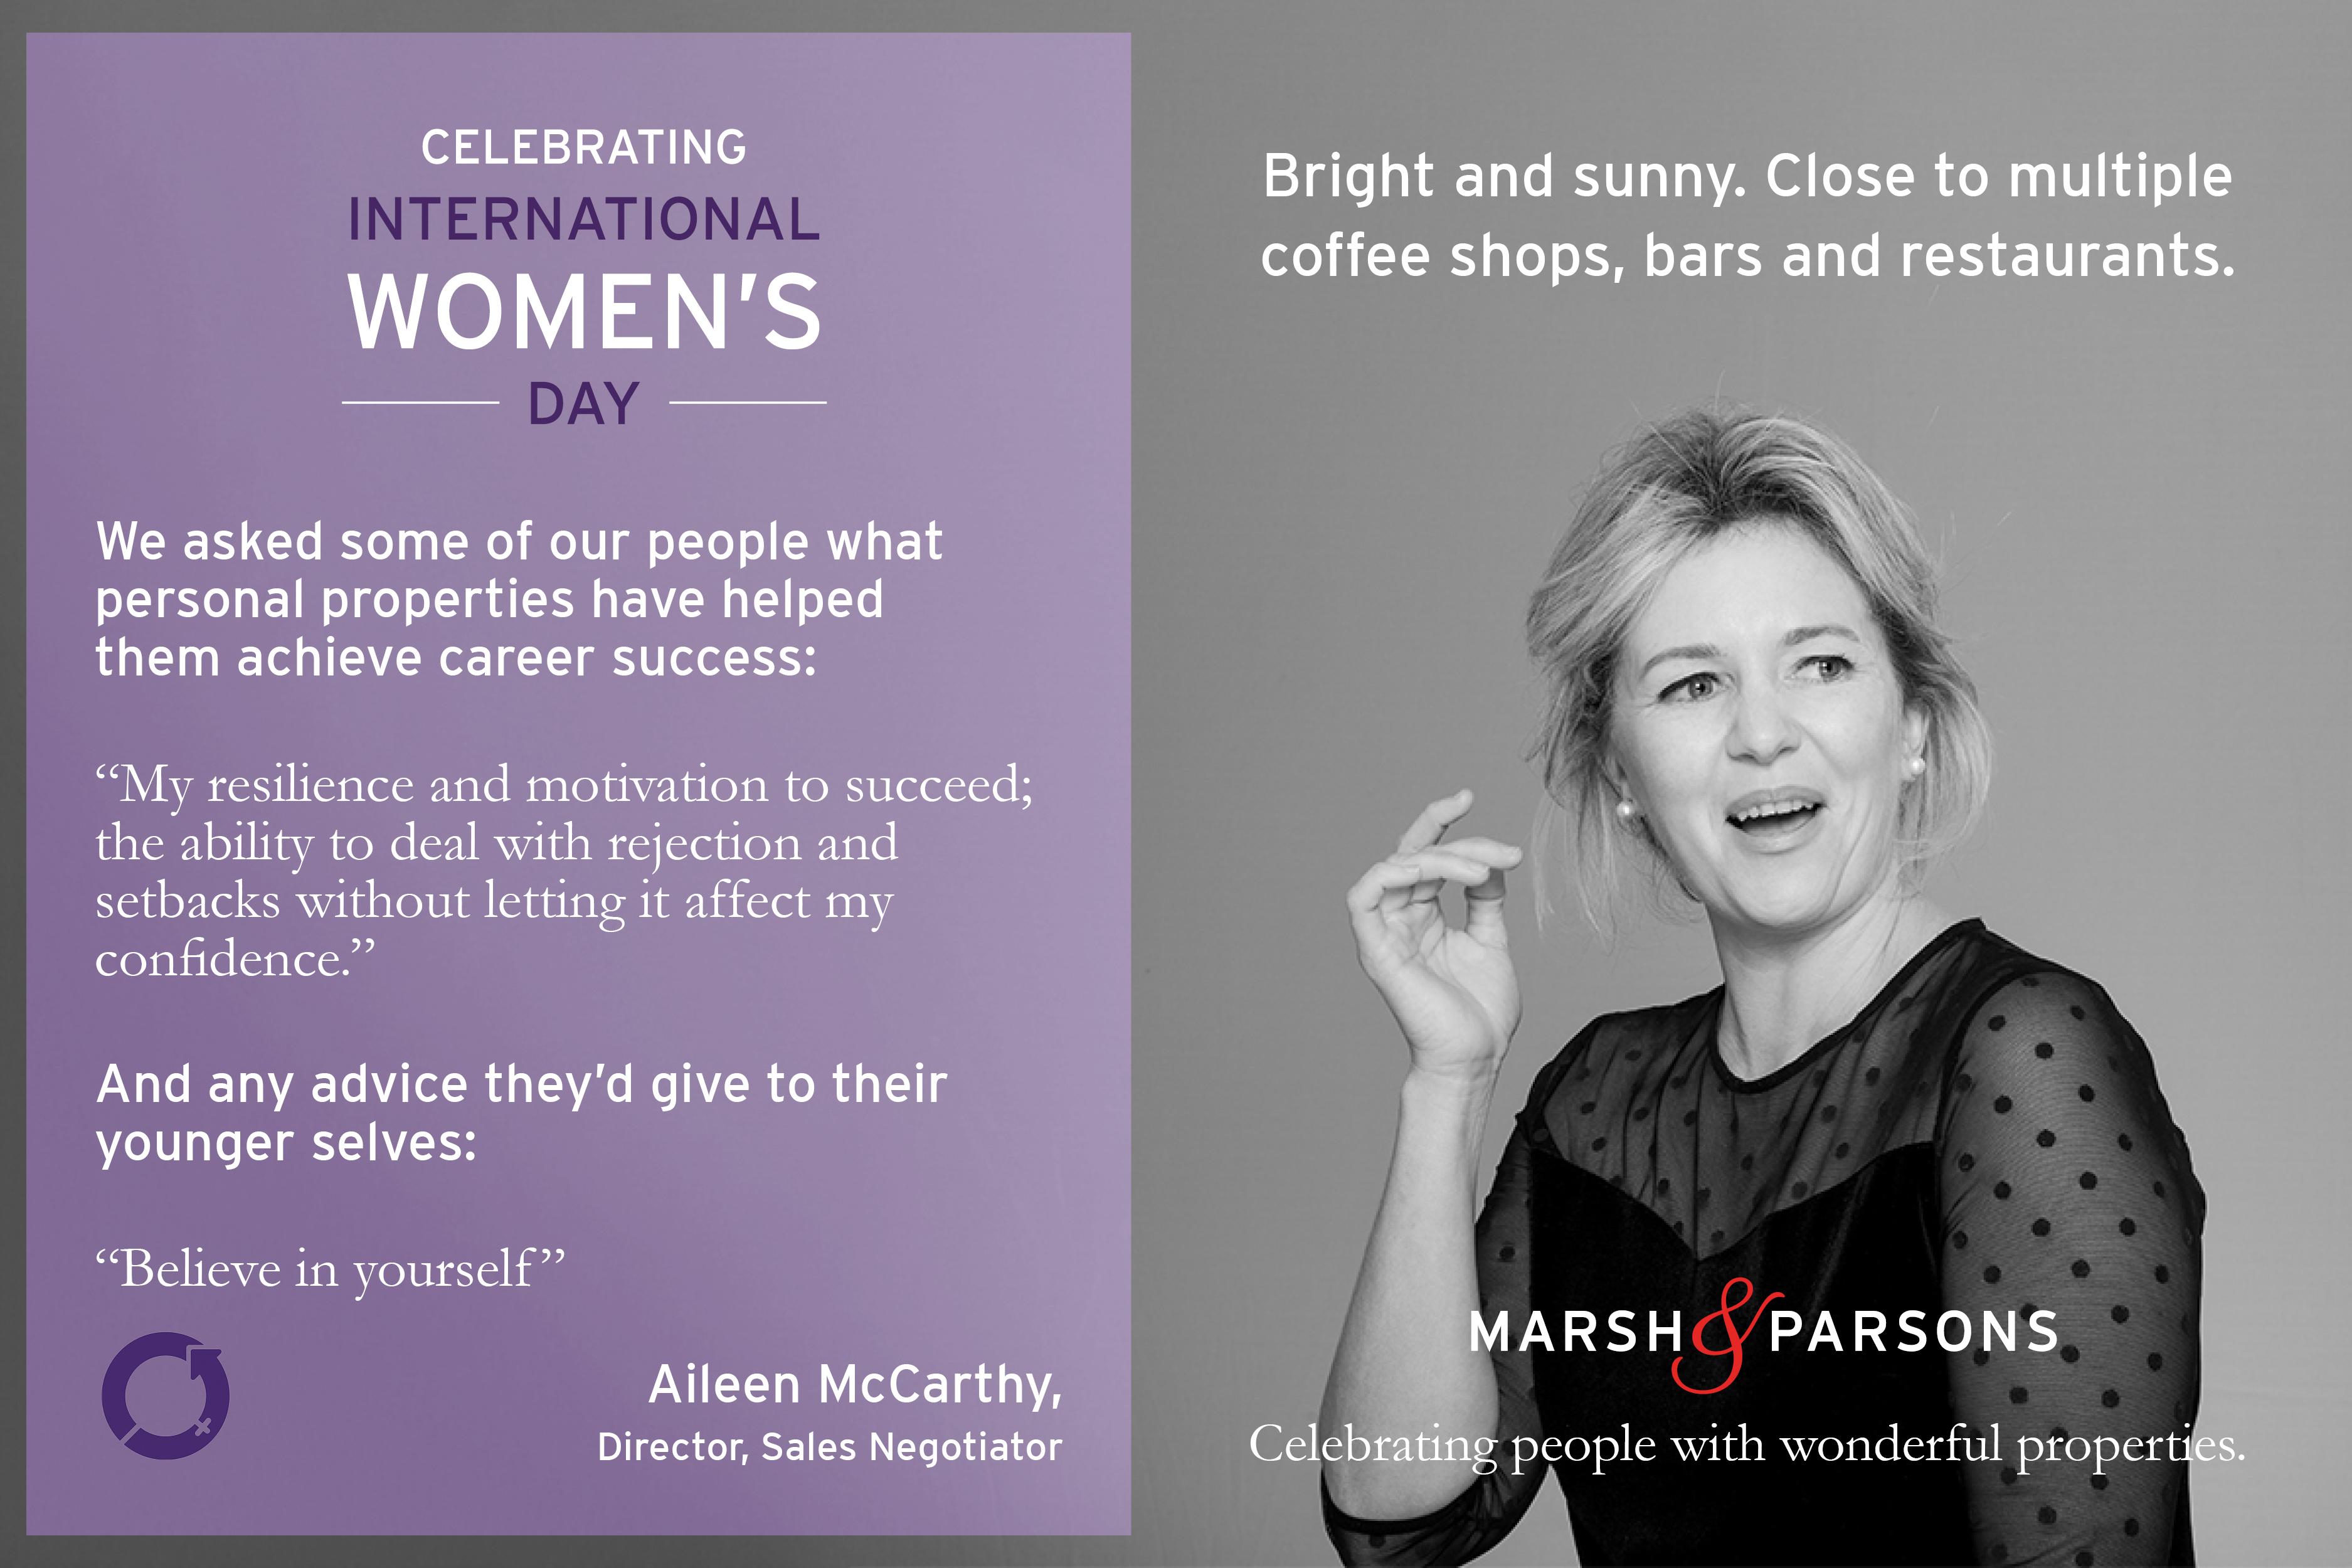 Aileen McCarthy, International Women's Day